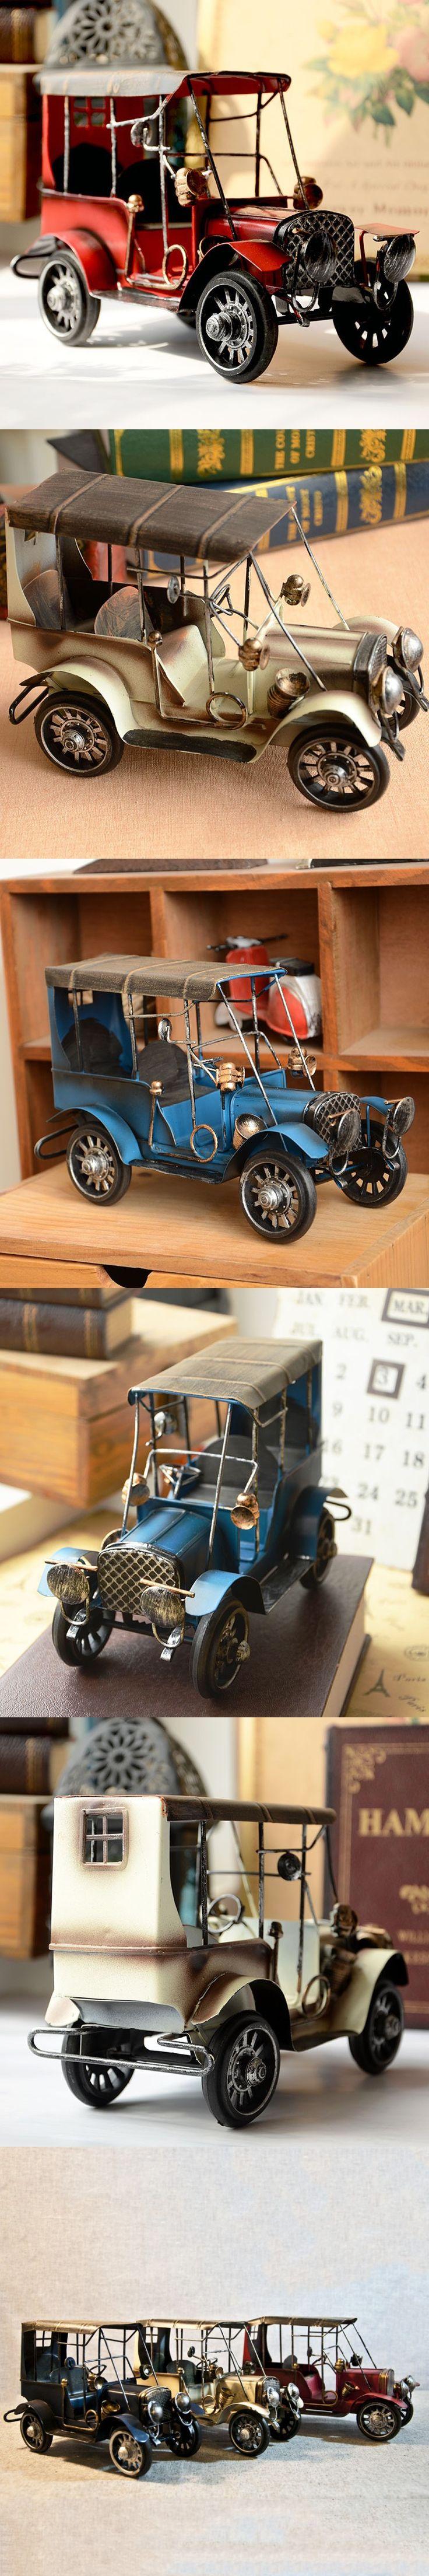 Zakka vintage car do old ford restor car tin toys gran torino nostalgic ornament handmade creative gifts crafts